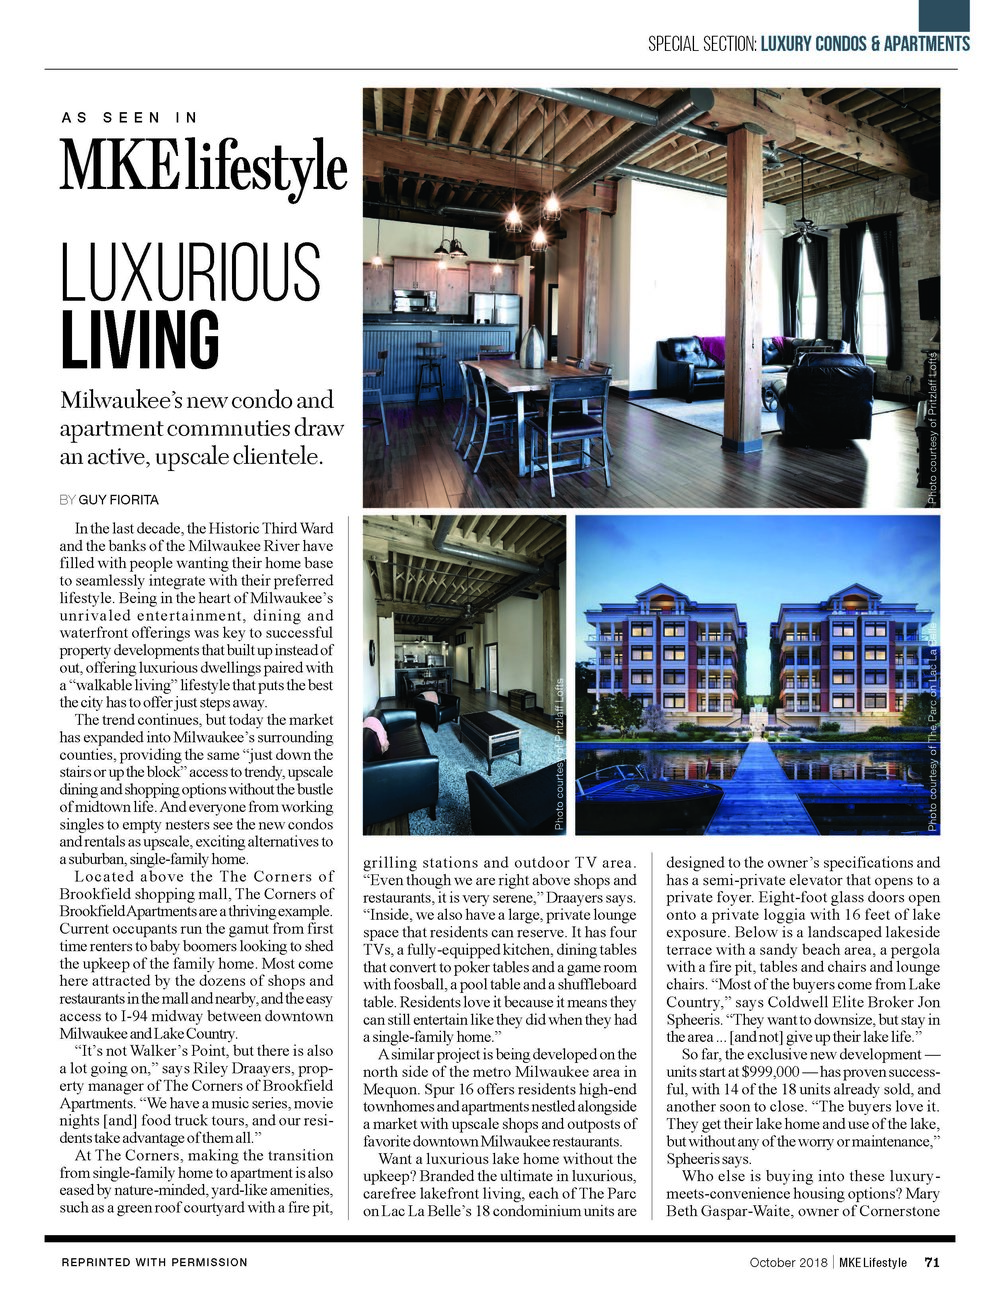 MKE Lifestyle_Oct 2018_Luxury Condos[1] 1.jpg